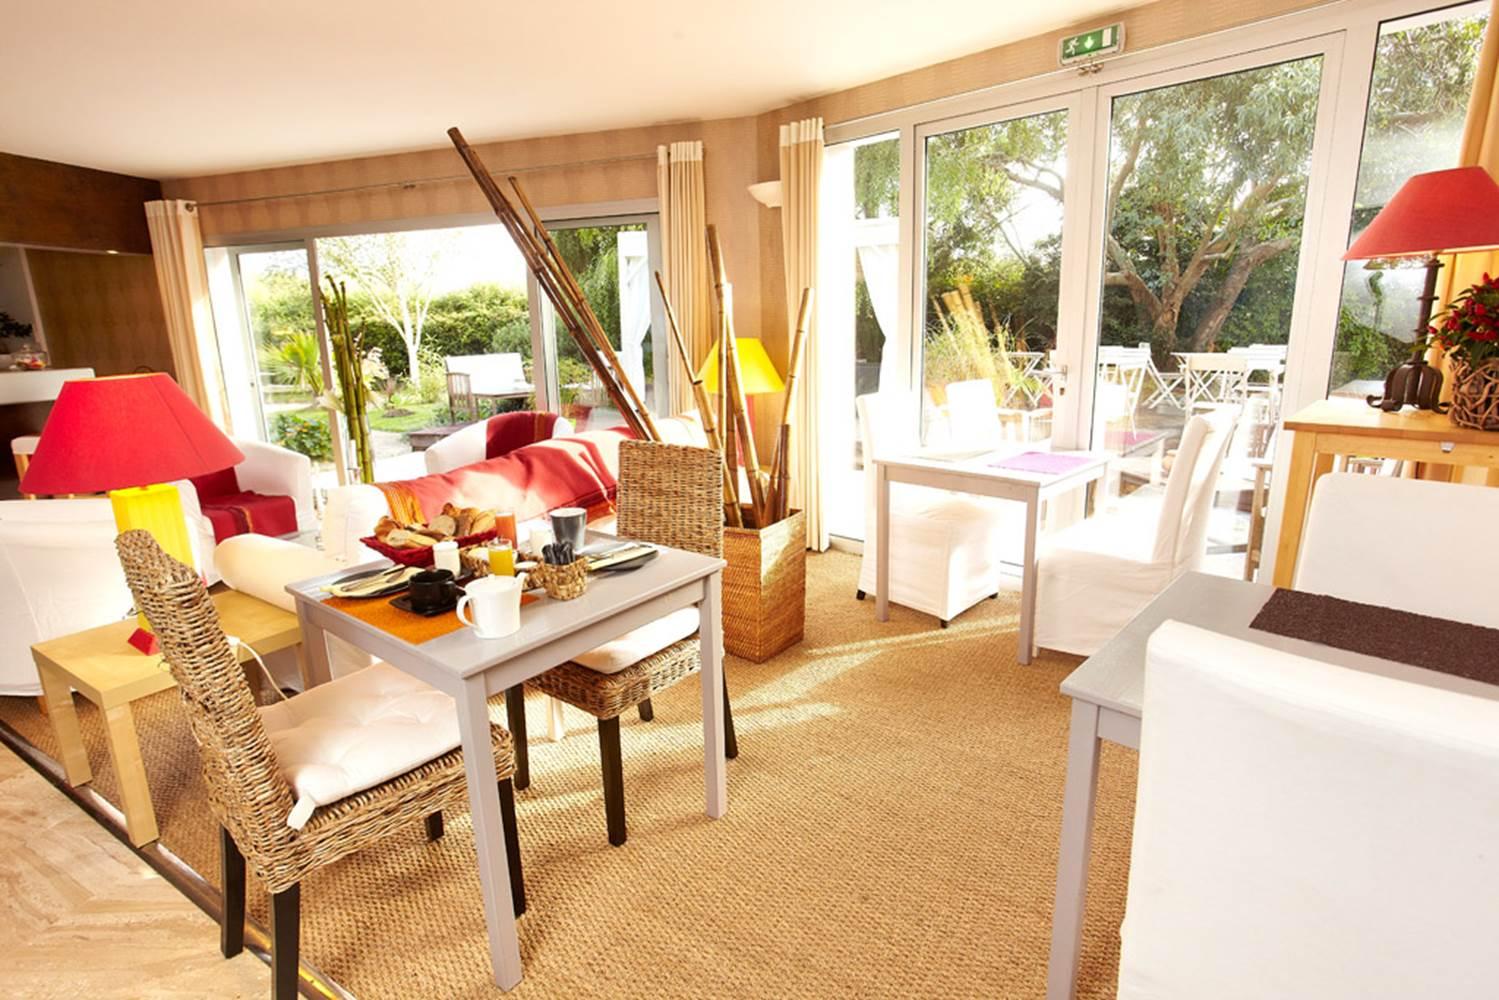 Hôtel Carnac Lodge-Plouharnel-Morbihan Bretagne sud ©